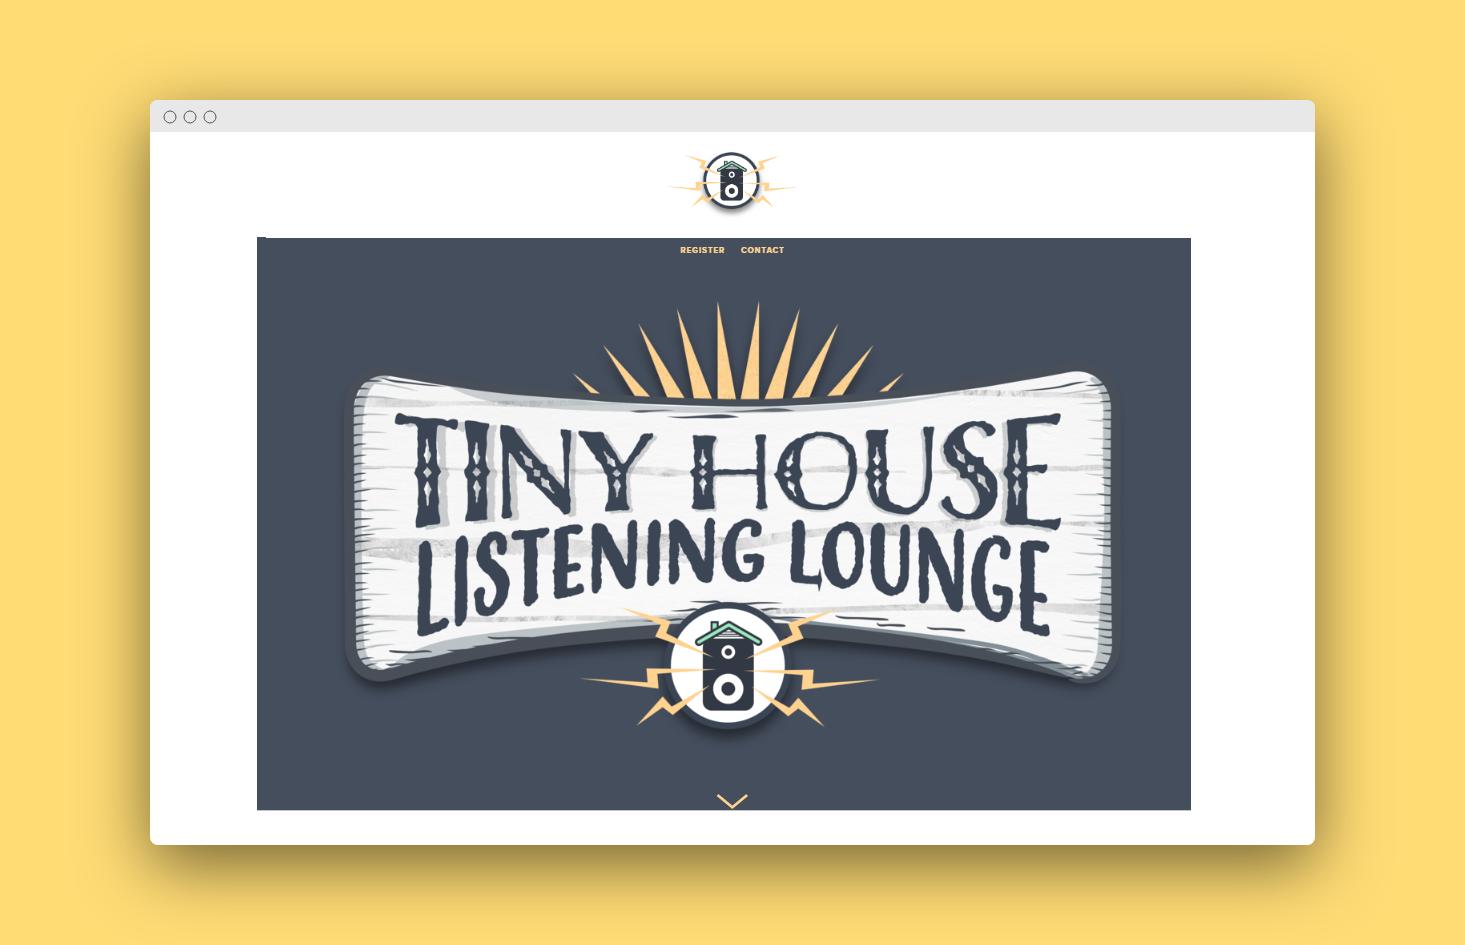 mindfull-marketing-nashville-tinyhouselisteinglounge-mock-up.png